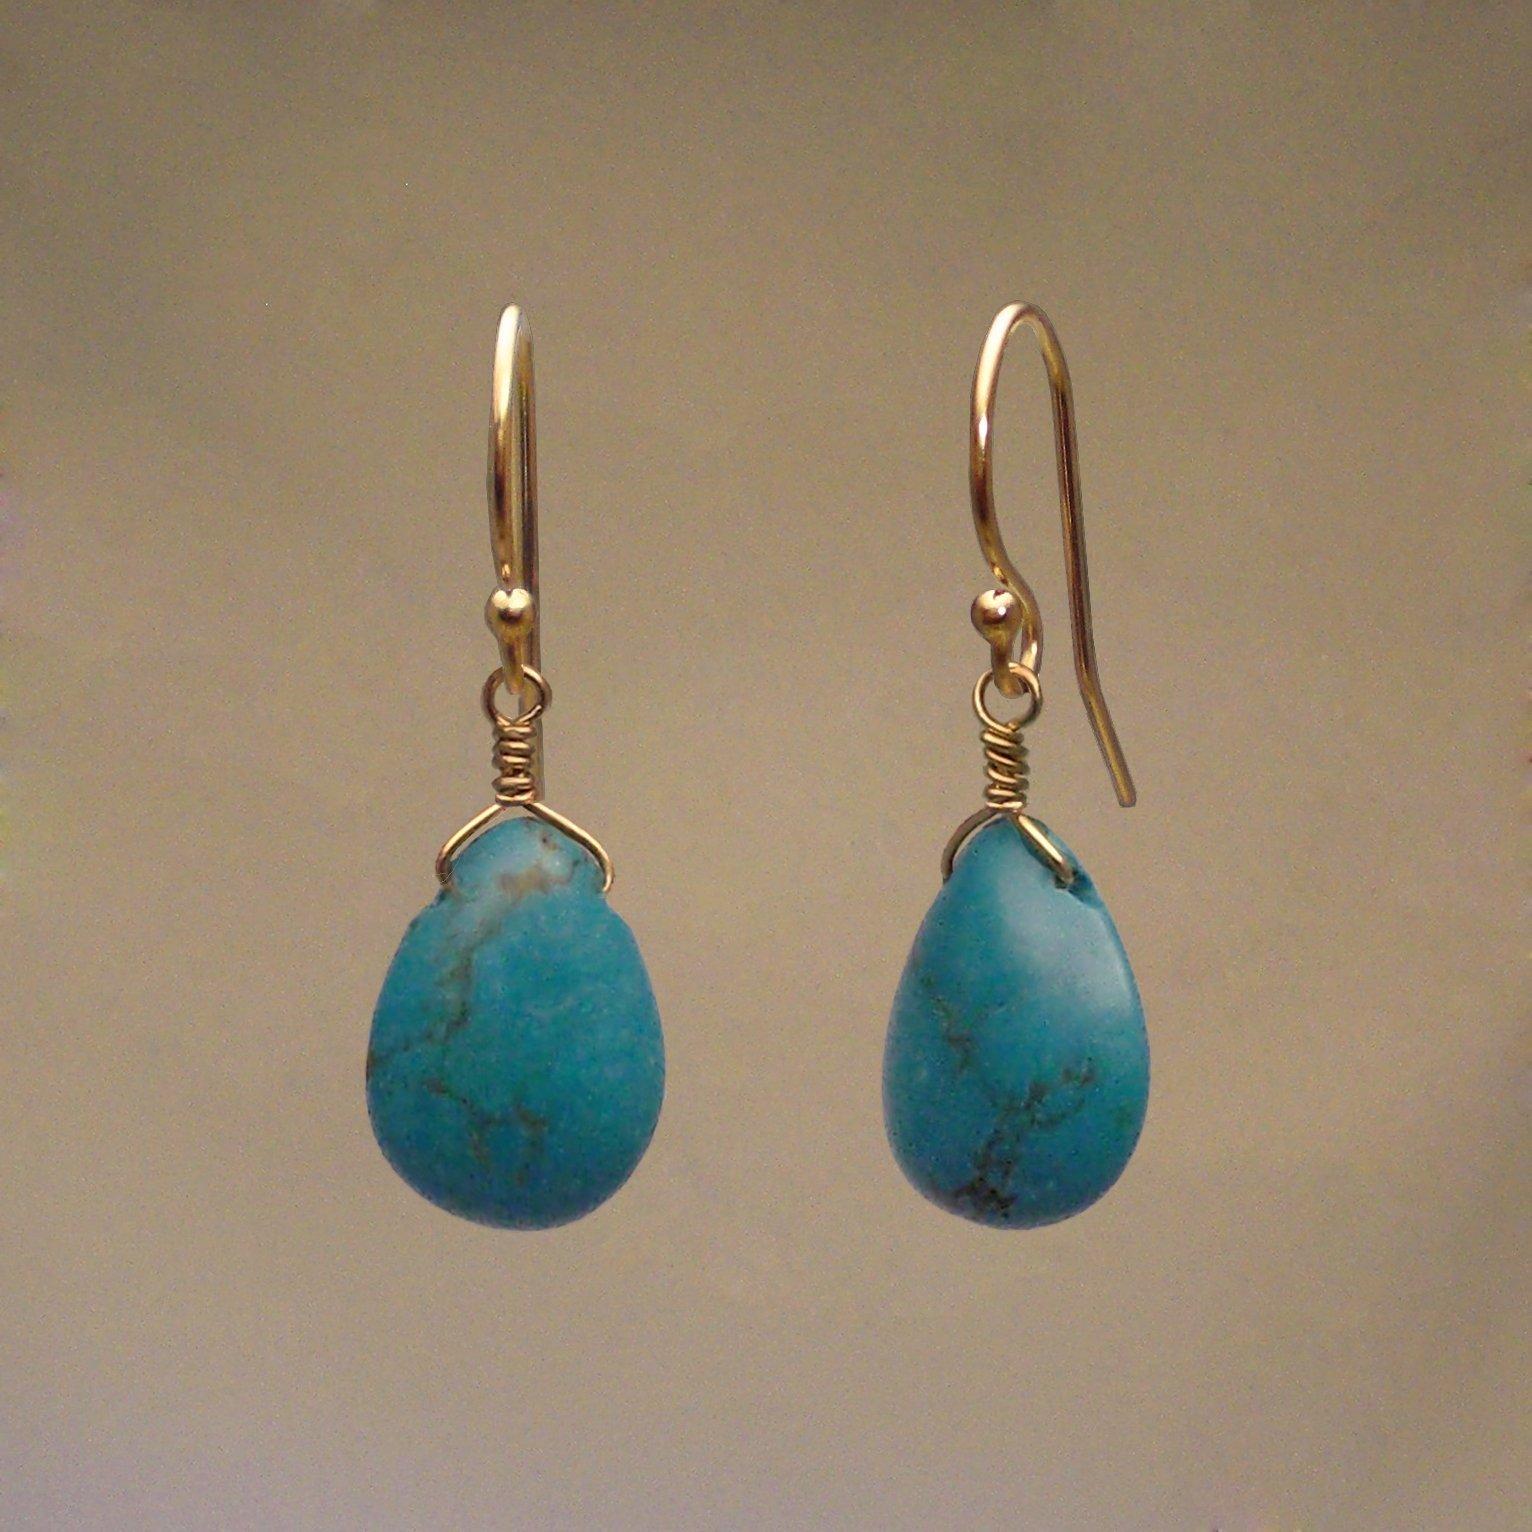 Turquoise Gem Drop Earrings